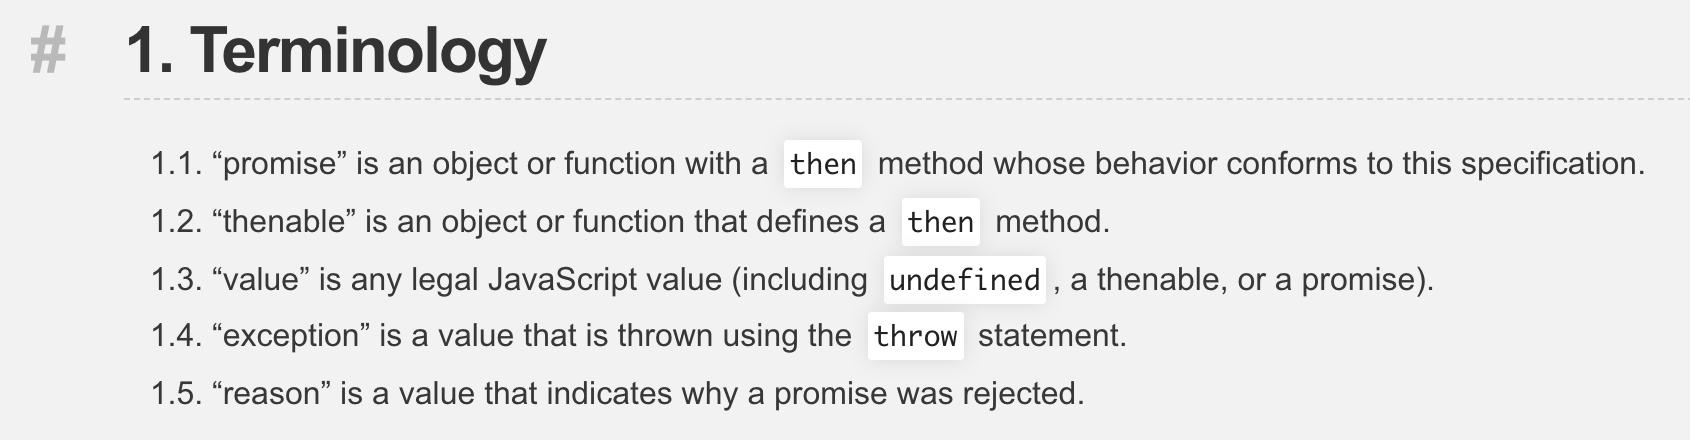 Promises/A+ Terminology